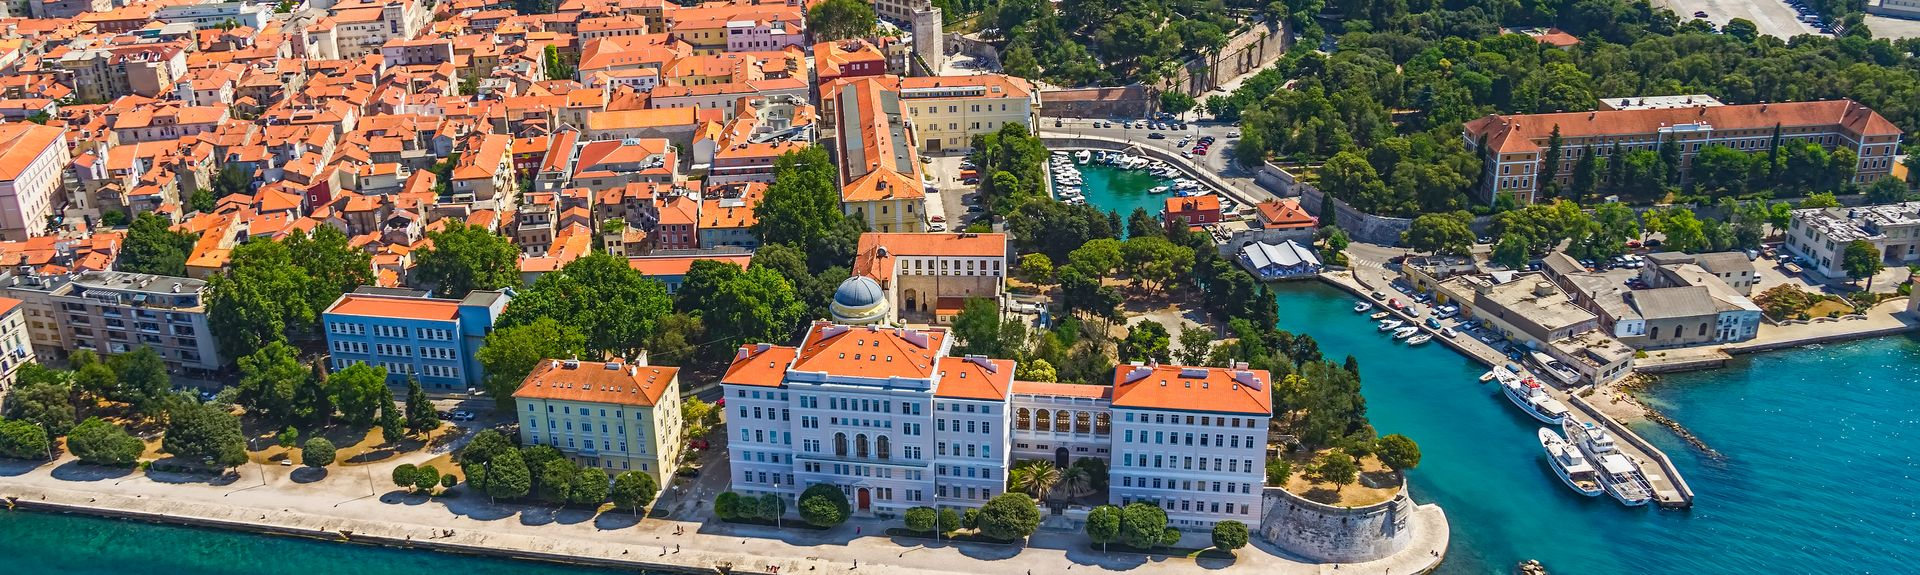 Zadar, Kroatia